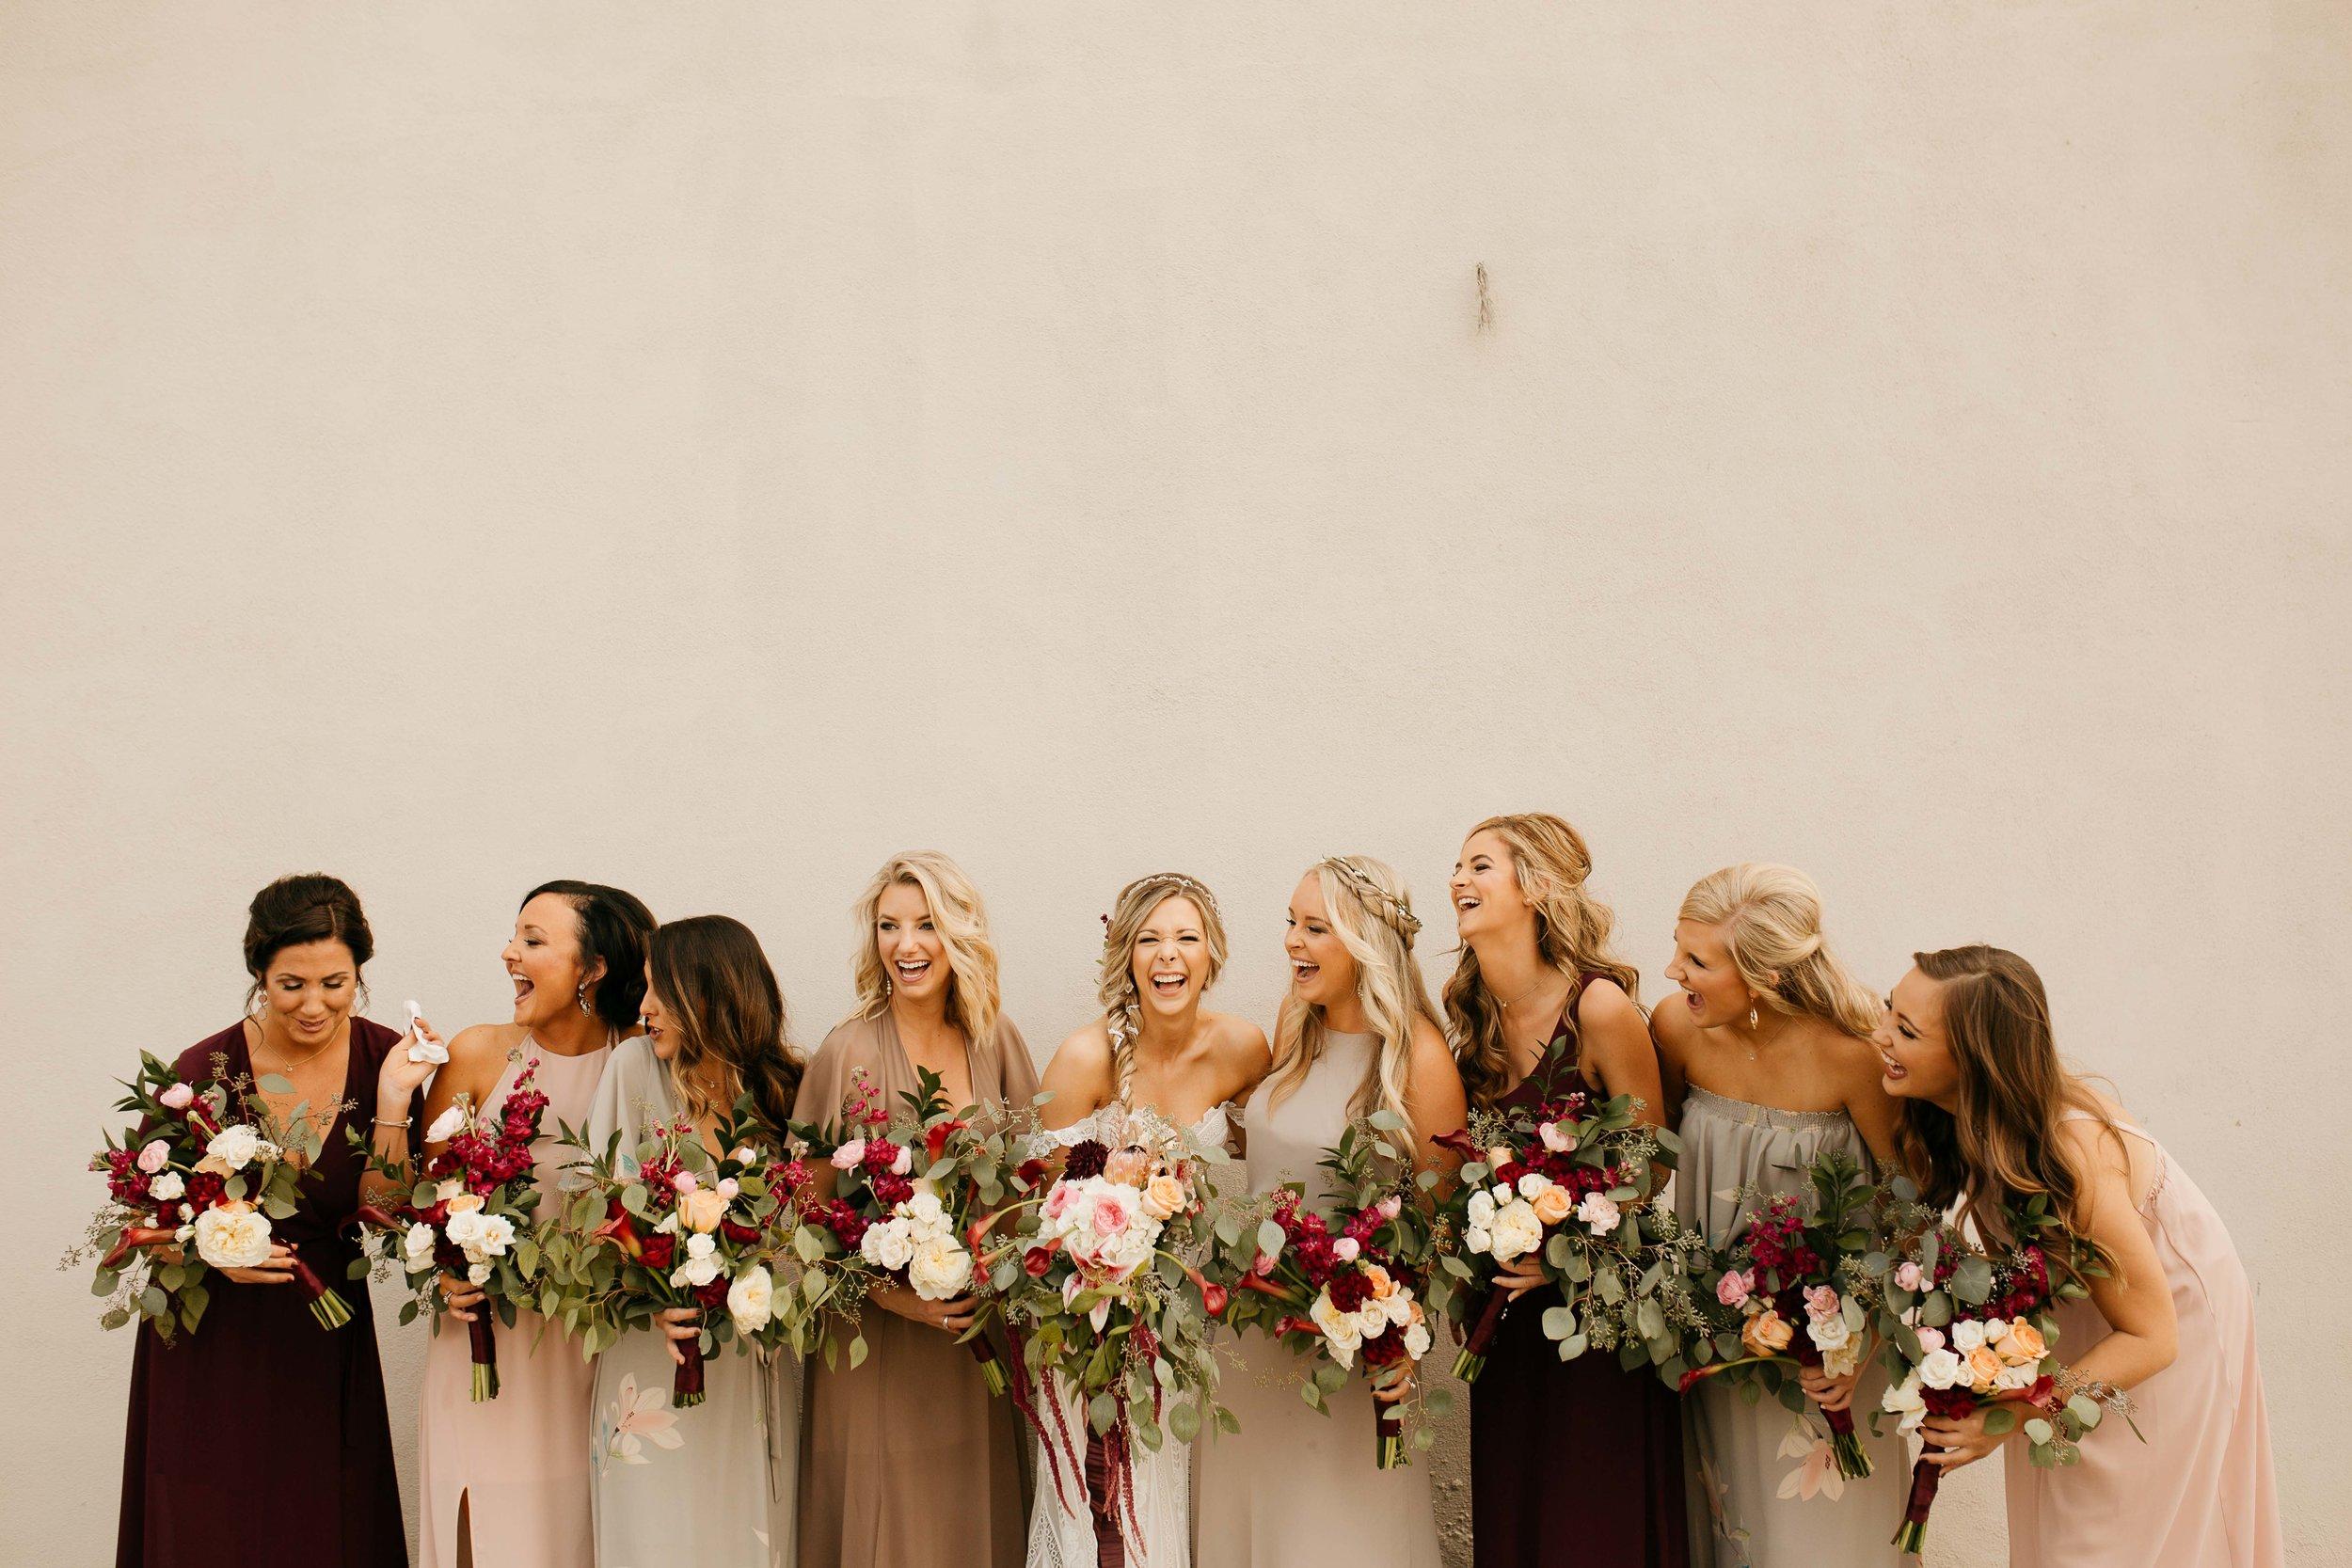 memphis tn wedding-21.jpg